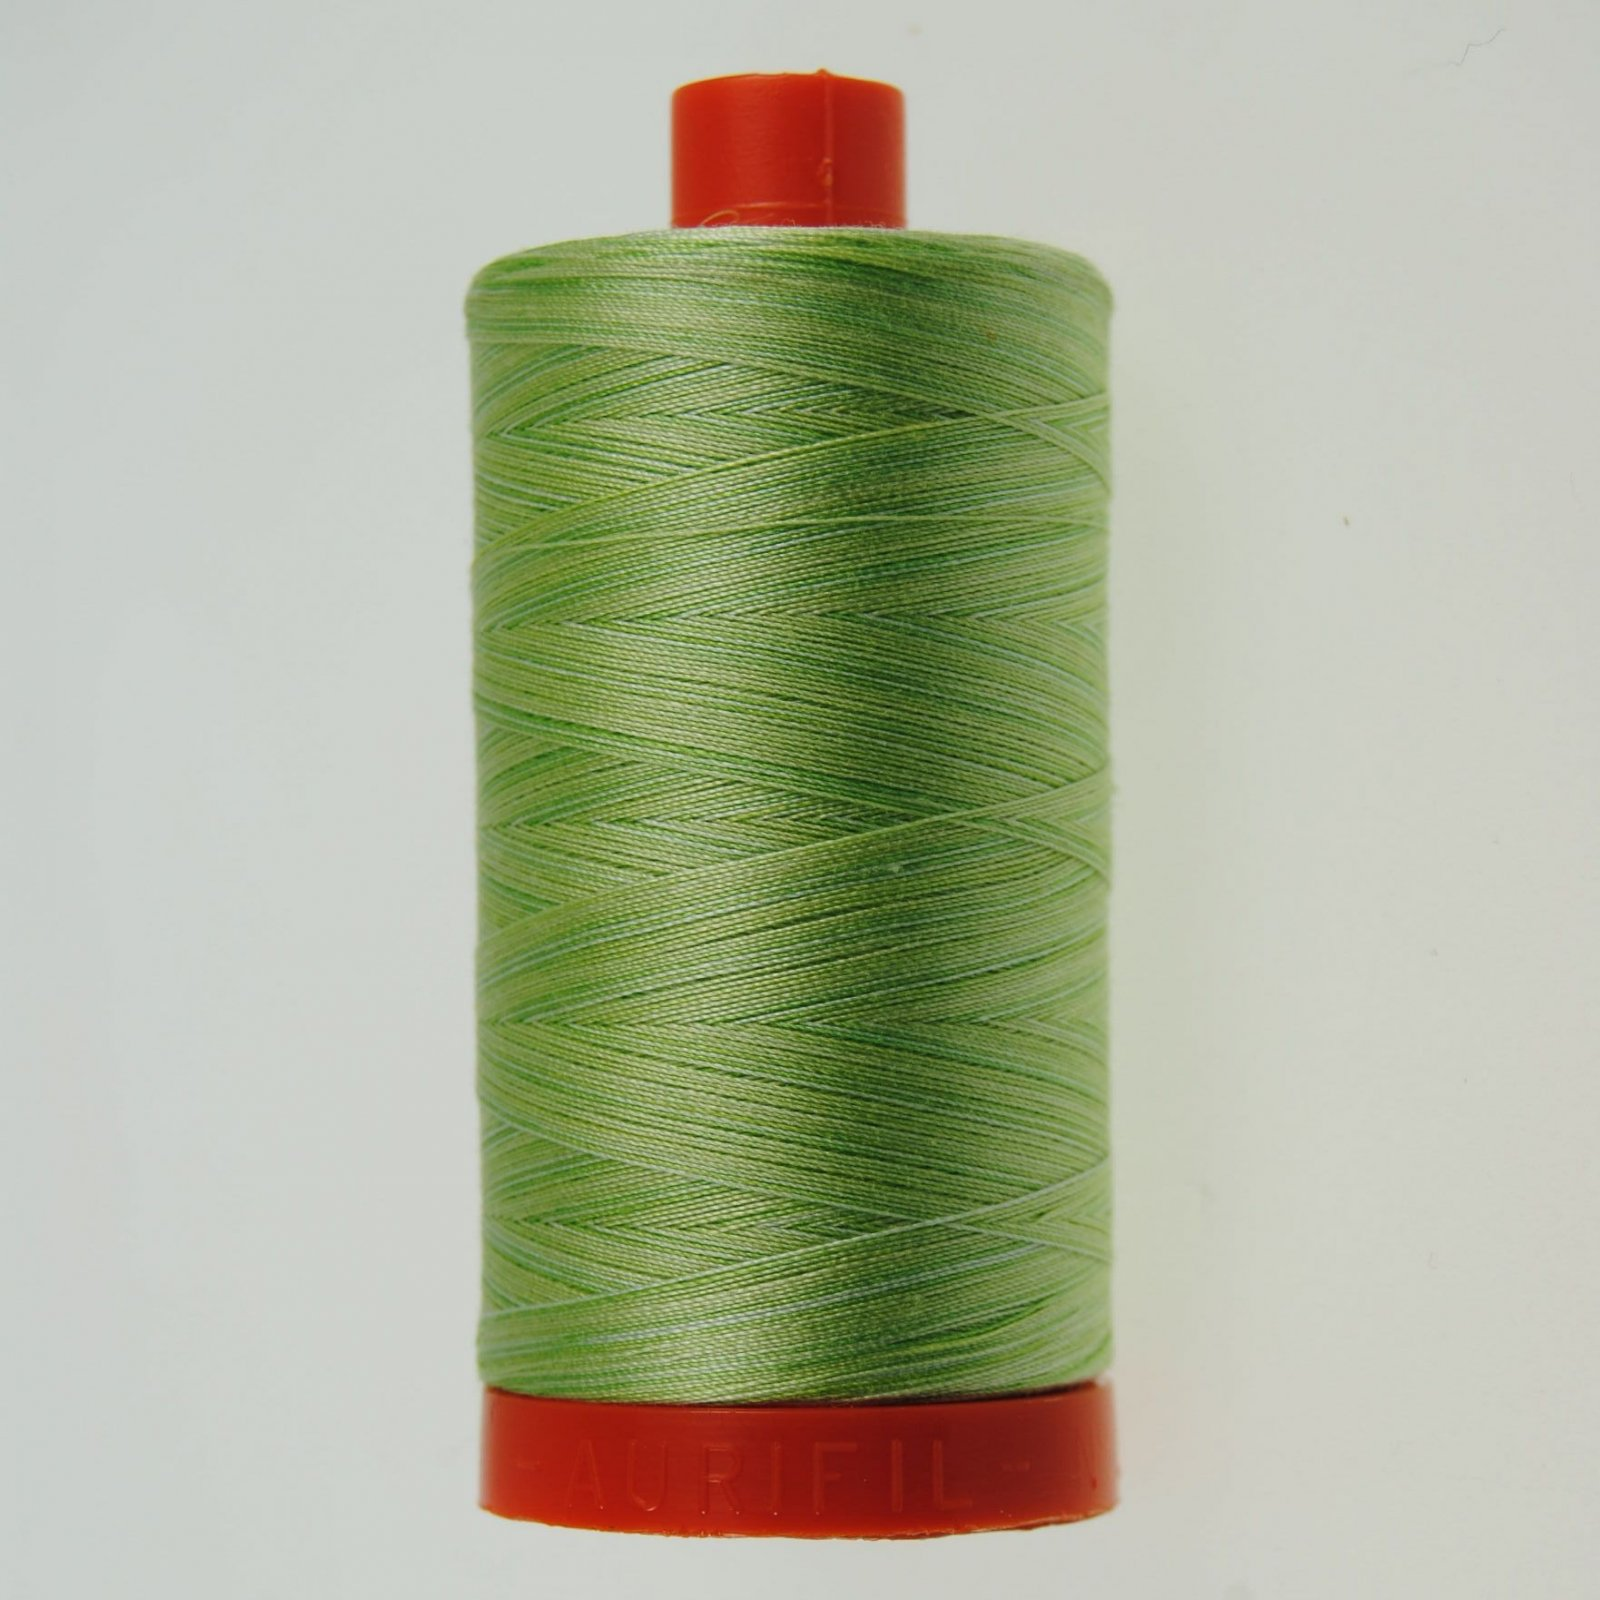 Aurifil Cotton Mako' 50 - 3320 - Ombre Greens